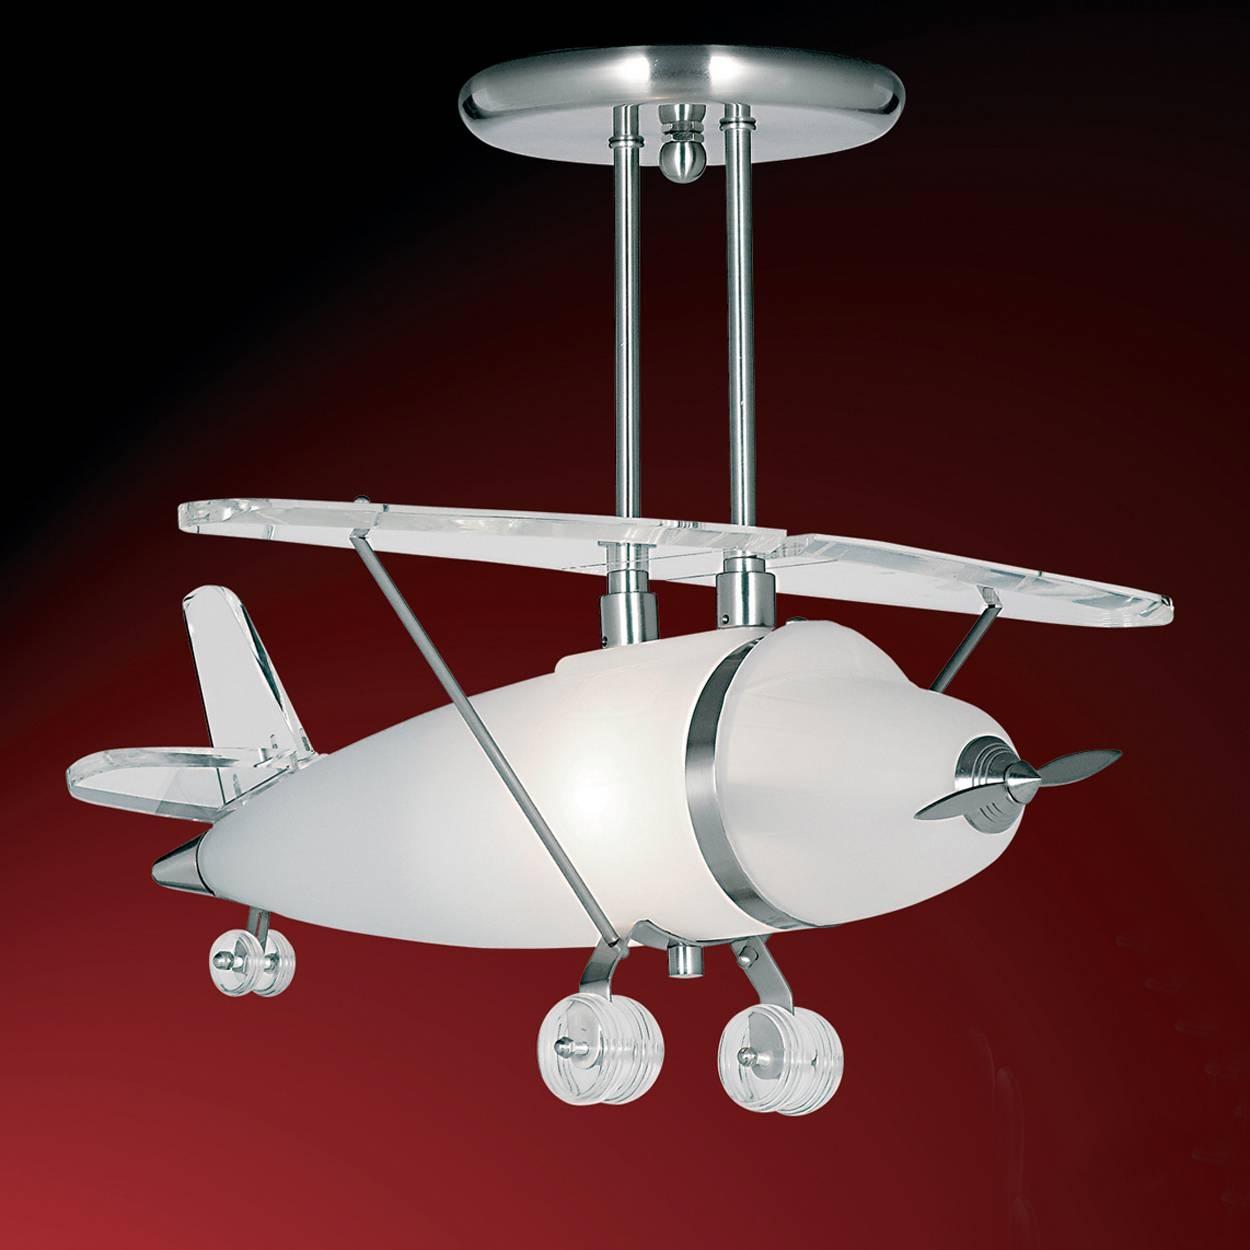 Airplane Pendant Light Fixture : Airplane Pendant Light Fixture with Airplane Pendant Lights (Image 5 of 15)